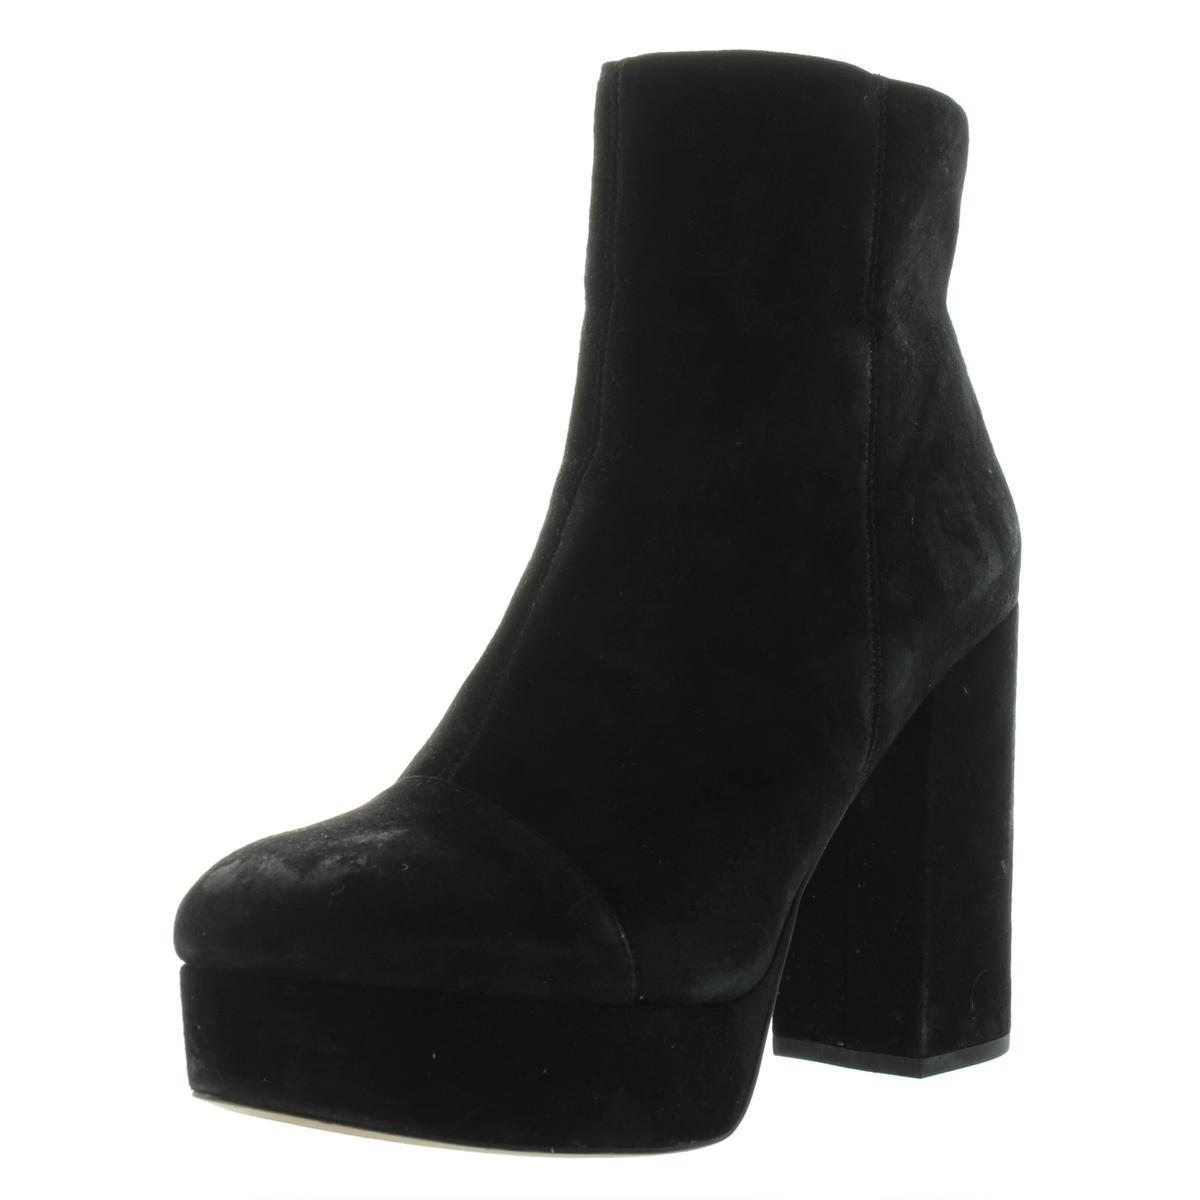 8b9c88f9092a20 Details about Sam Edelman Womens Azra Black Suede Booties Platforms 10  Medium (B